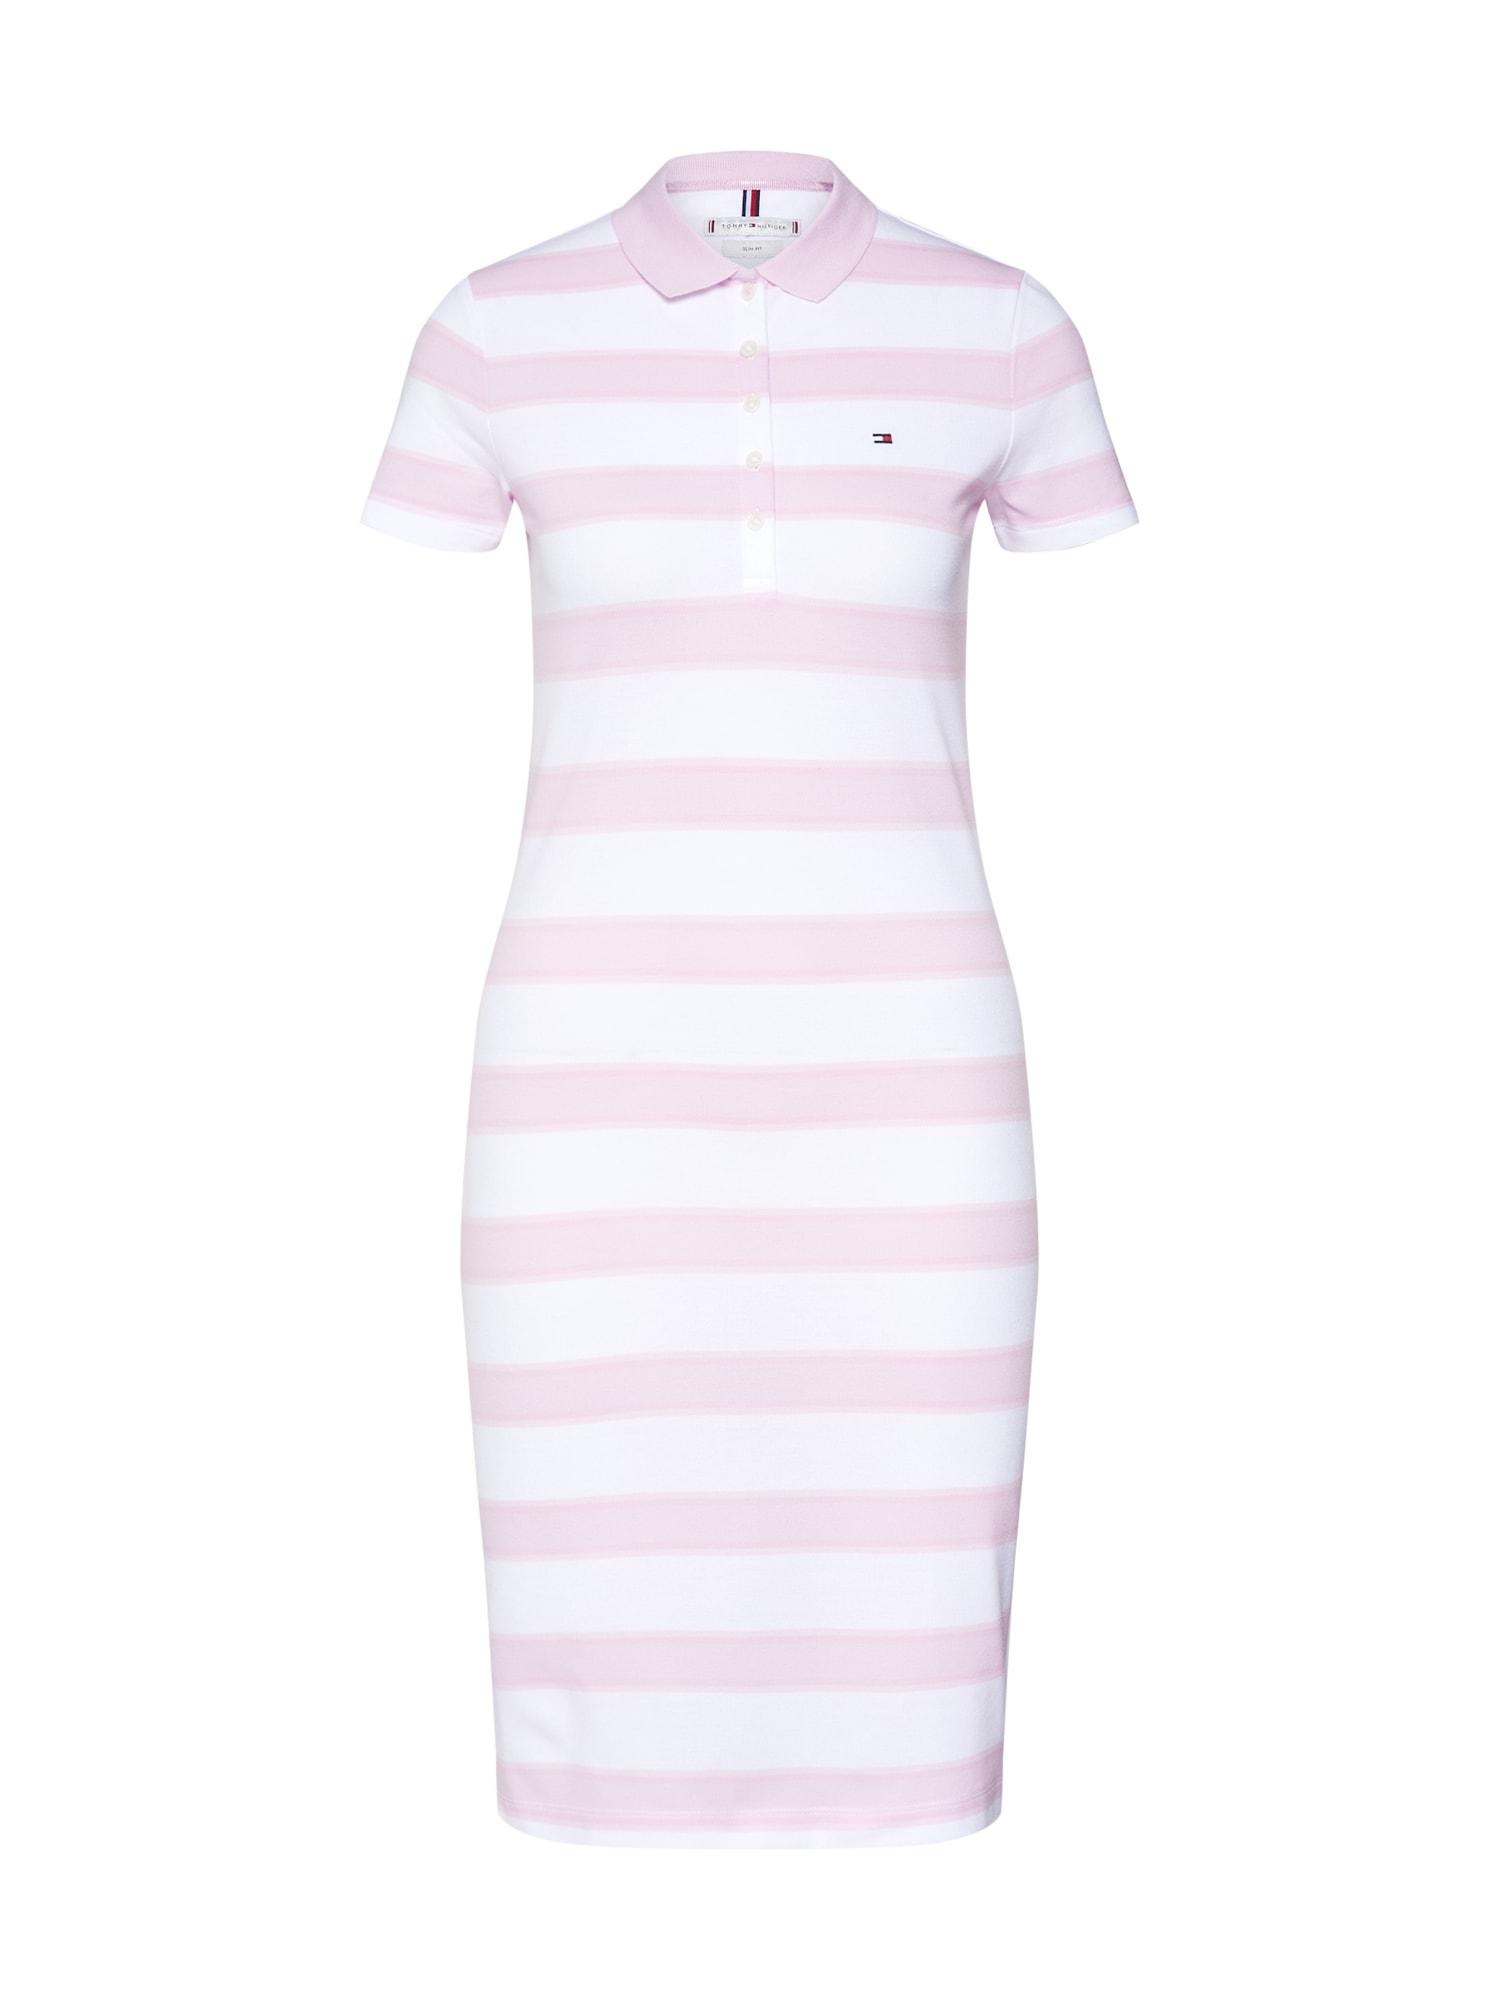 Šaty New Chiara pink bílá TOMMY HILFIGER